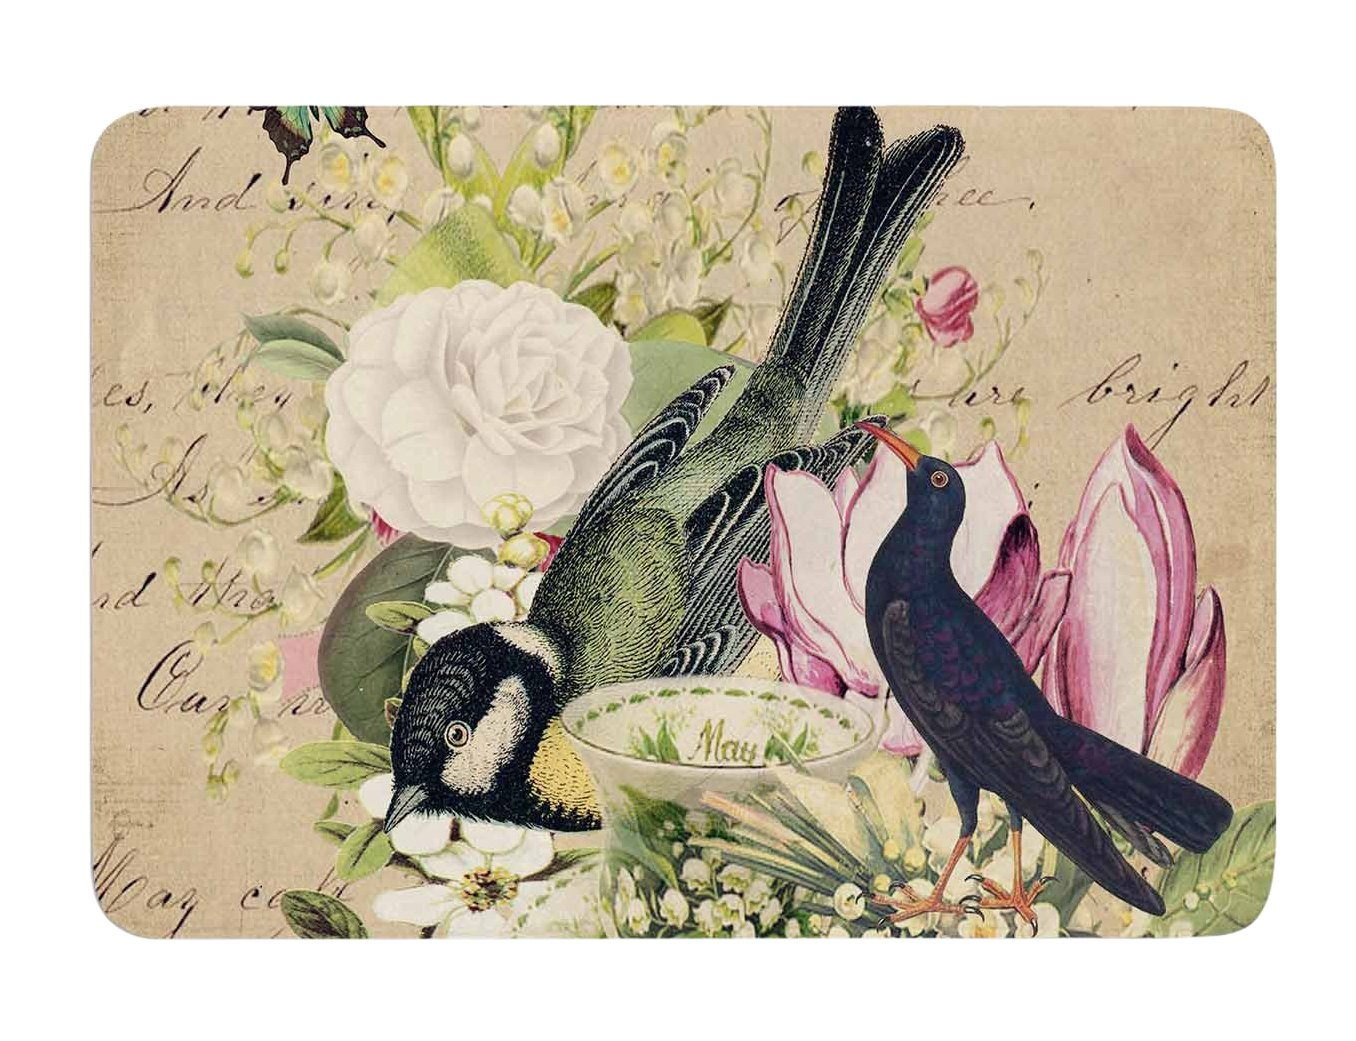 17 X 24 Kess InHouse Suzanne Carter Vintage Tea Bird Illustration Memory Foam Bath Mat 17 by 24-Inch